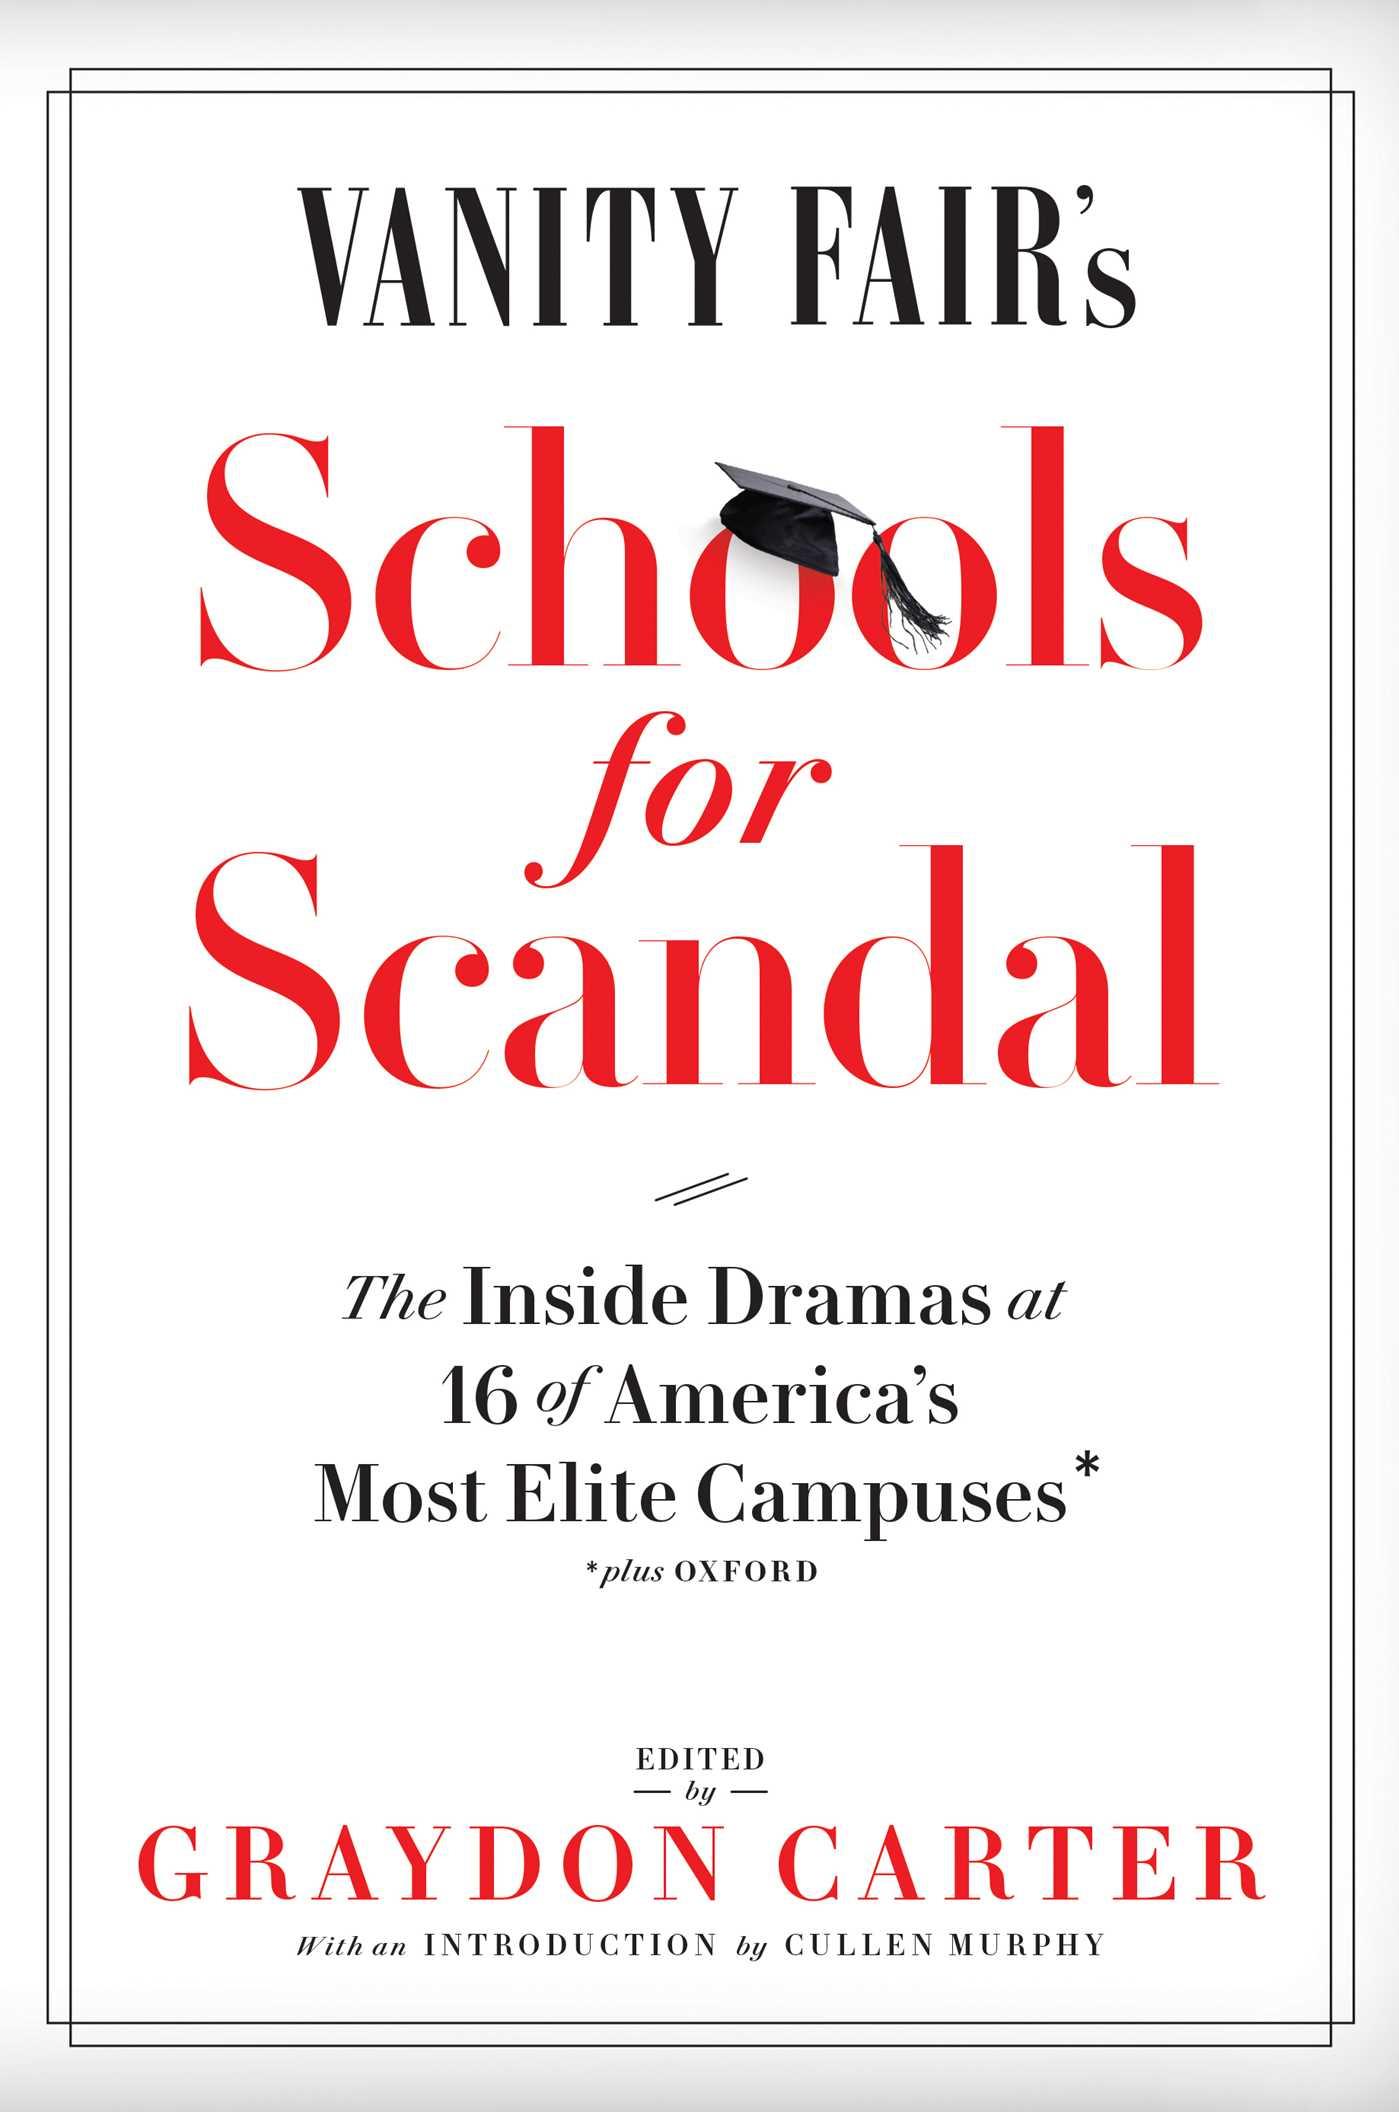 Vanity fairs schools for scandal 9781501173745 hr